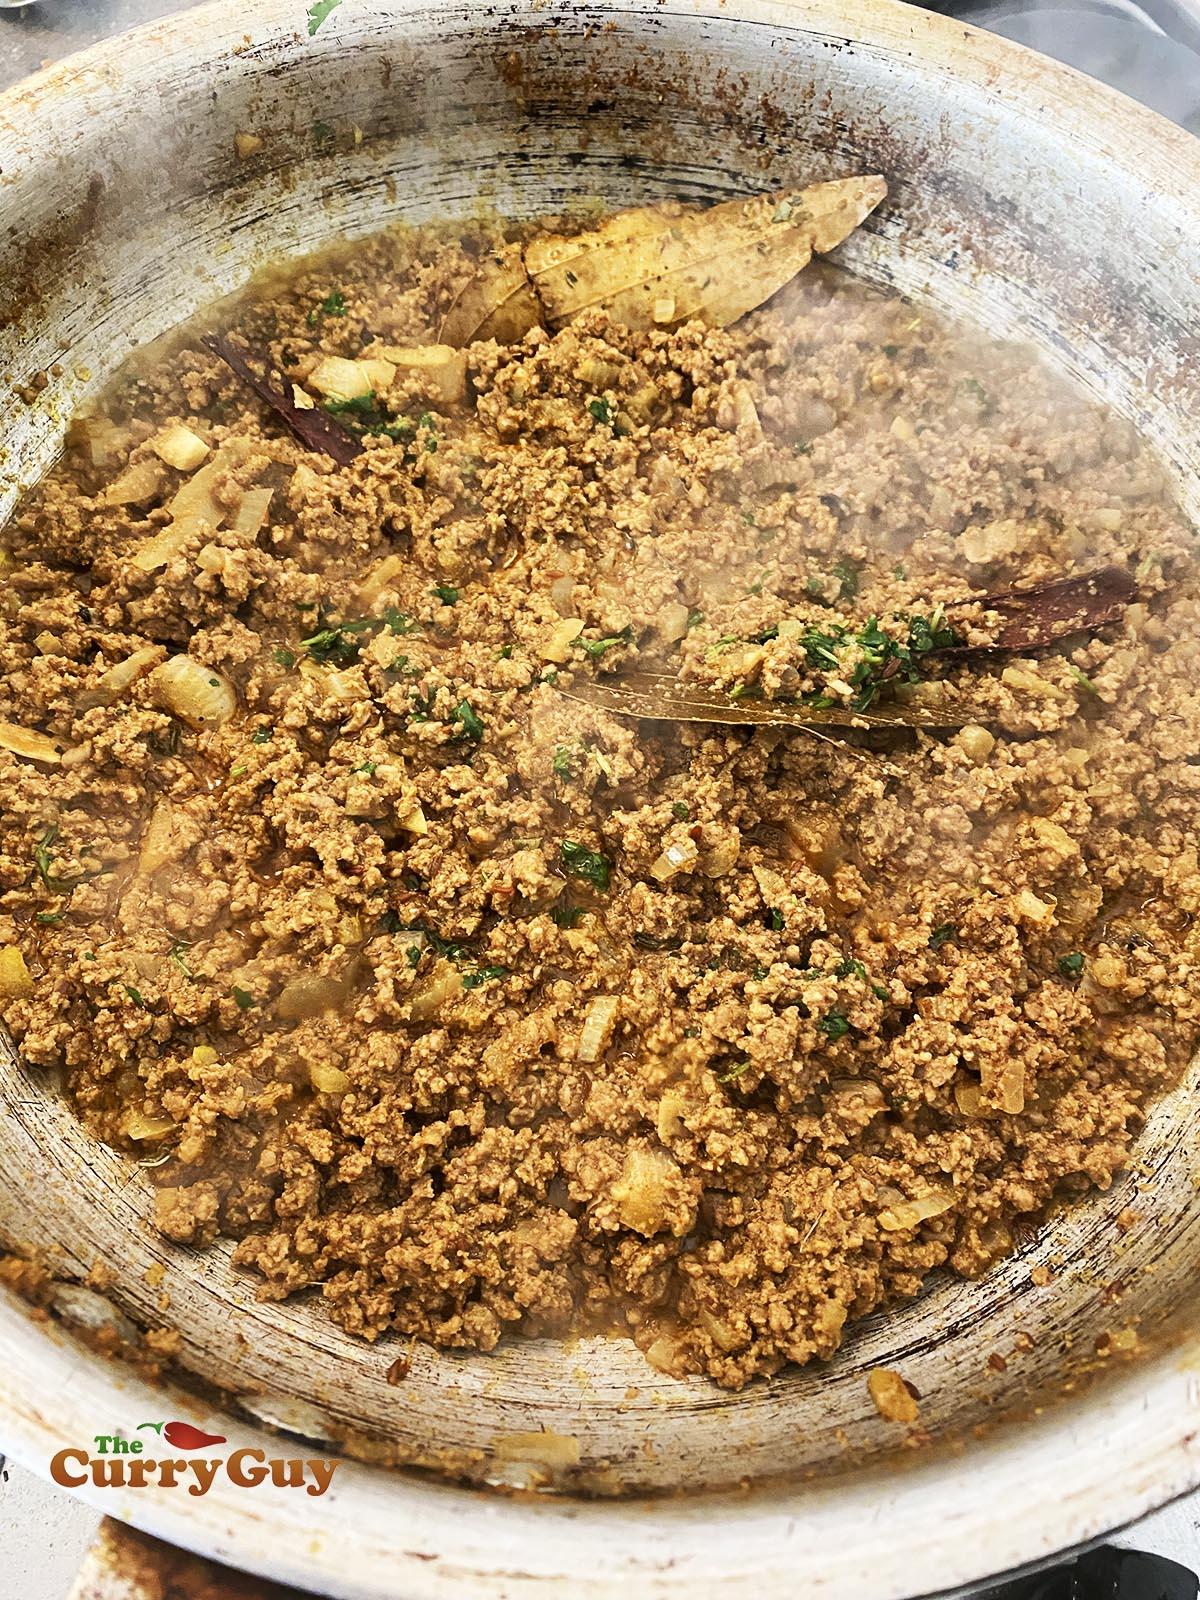 Finished keema recipe